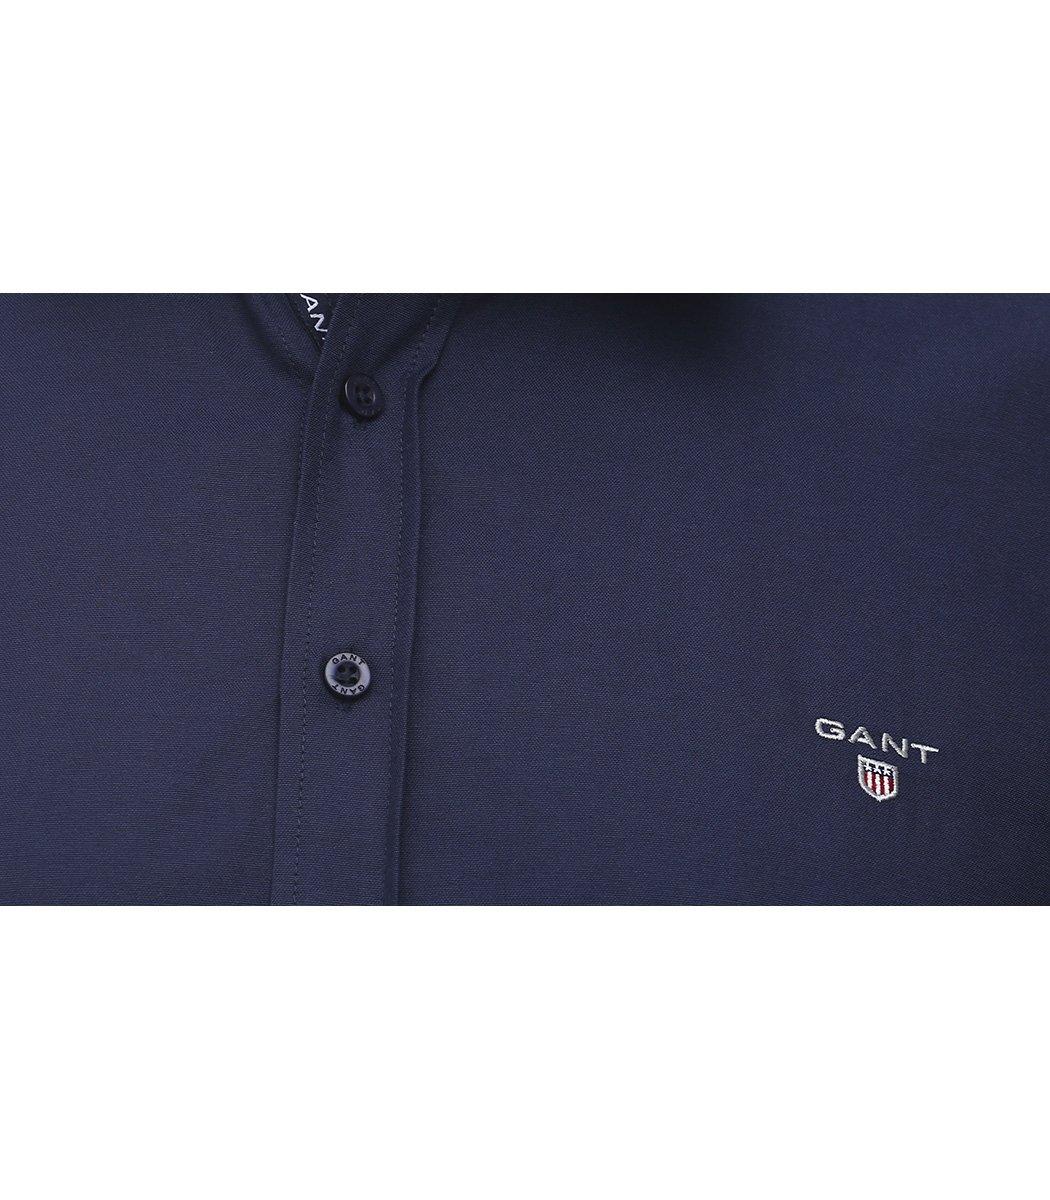 Темно-синяя классическая рубашка GANT RG1 - Темно-синий - Вид 4